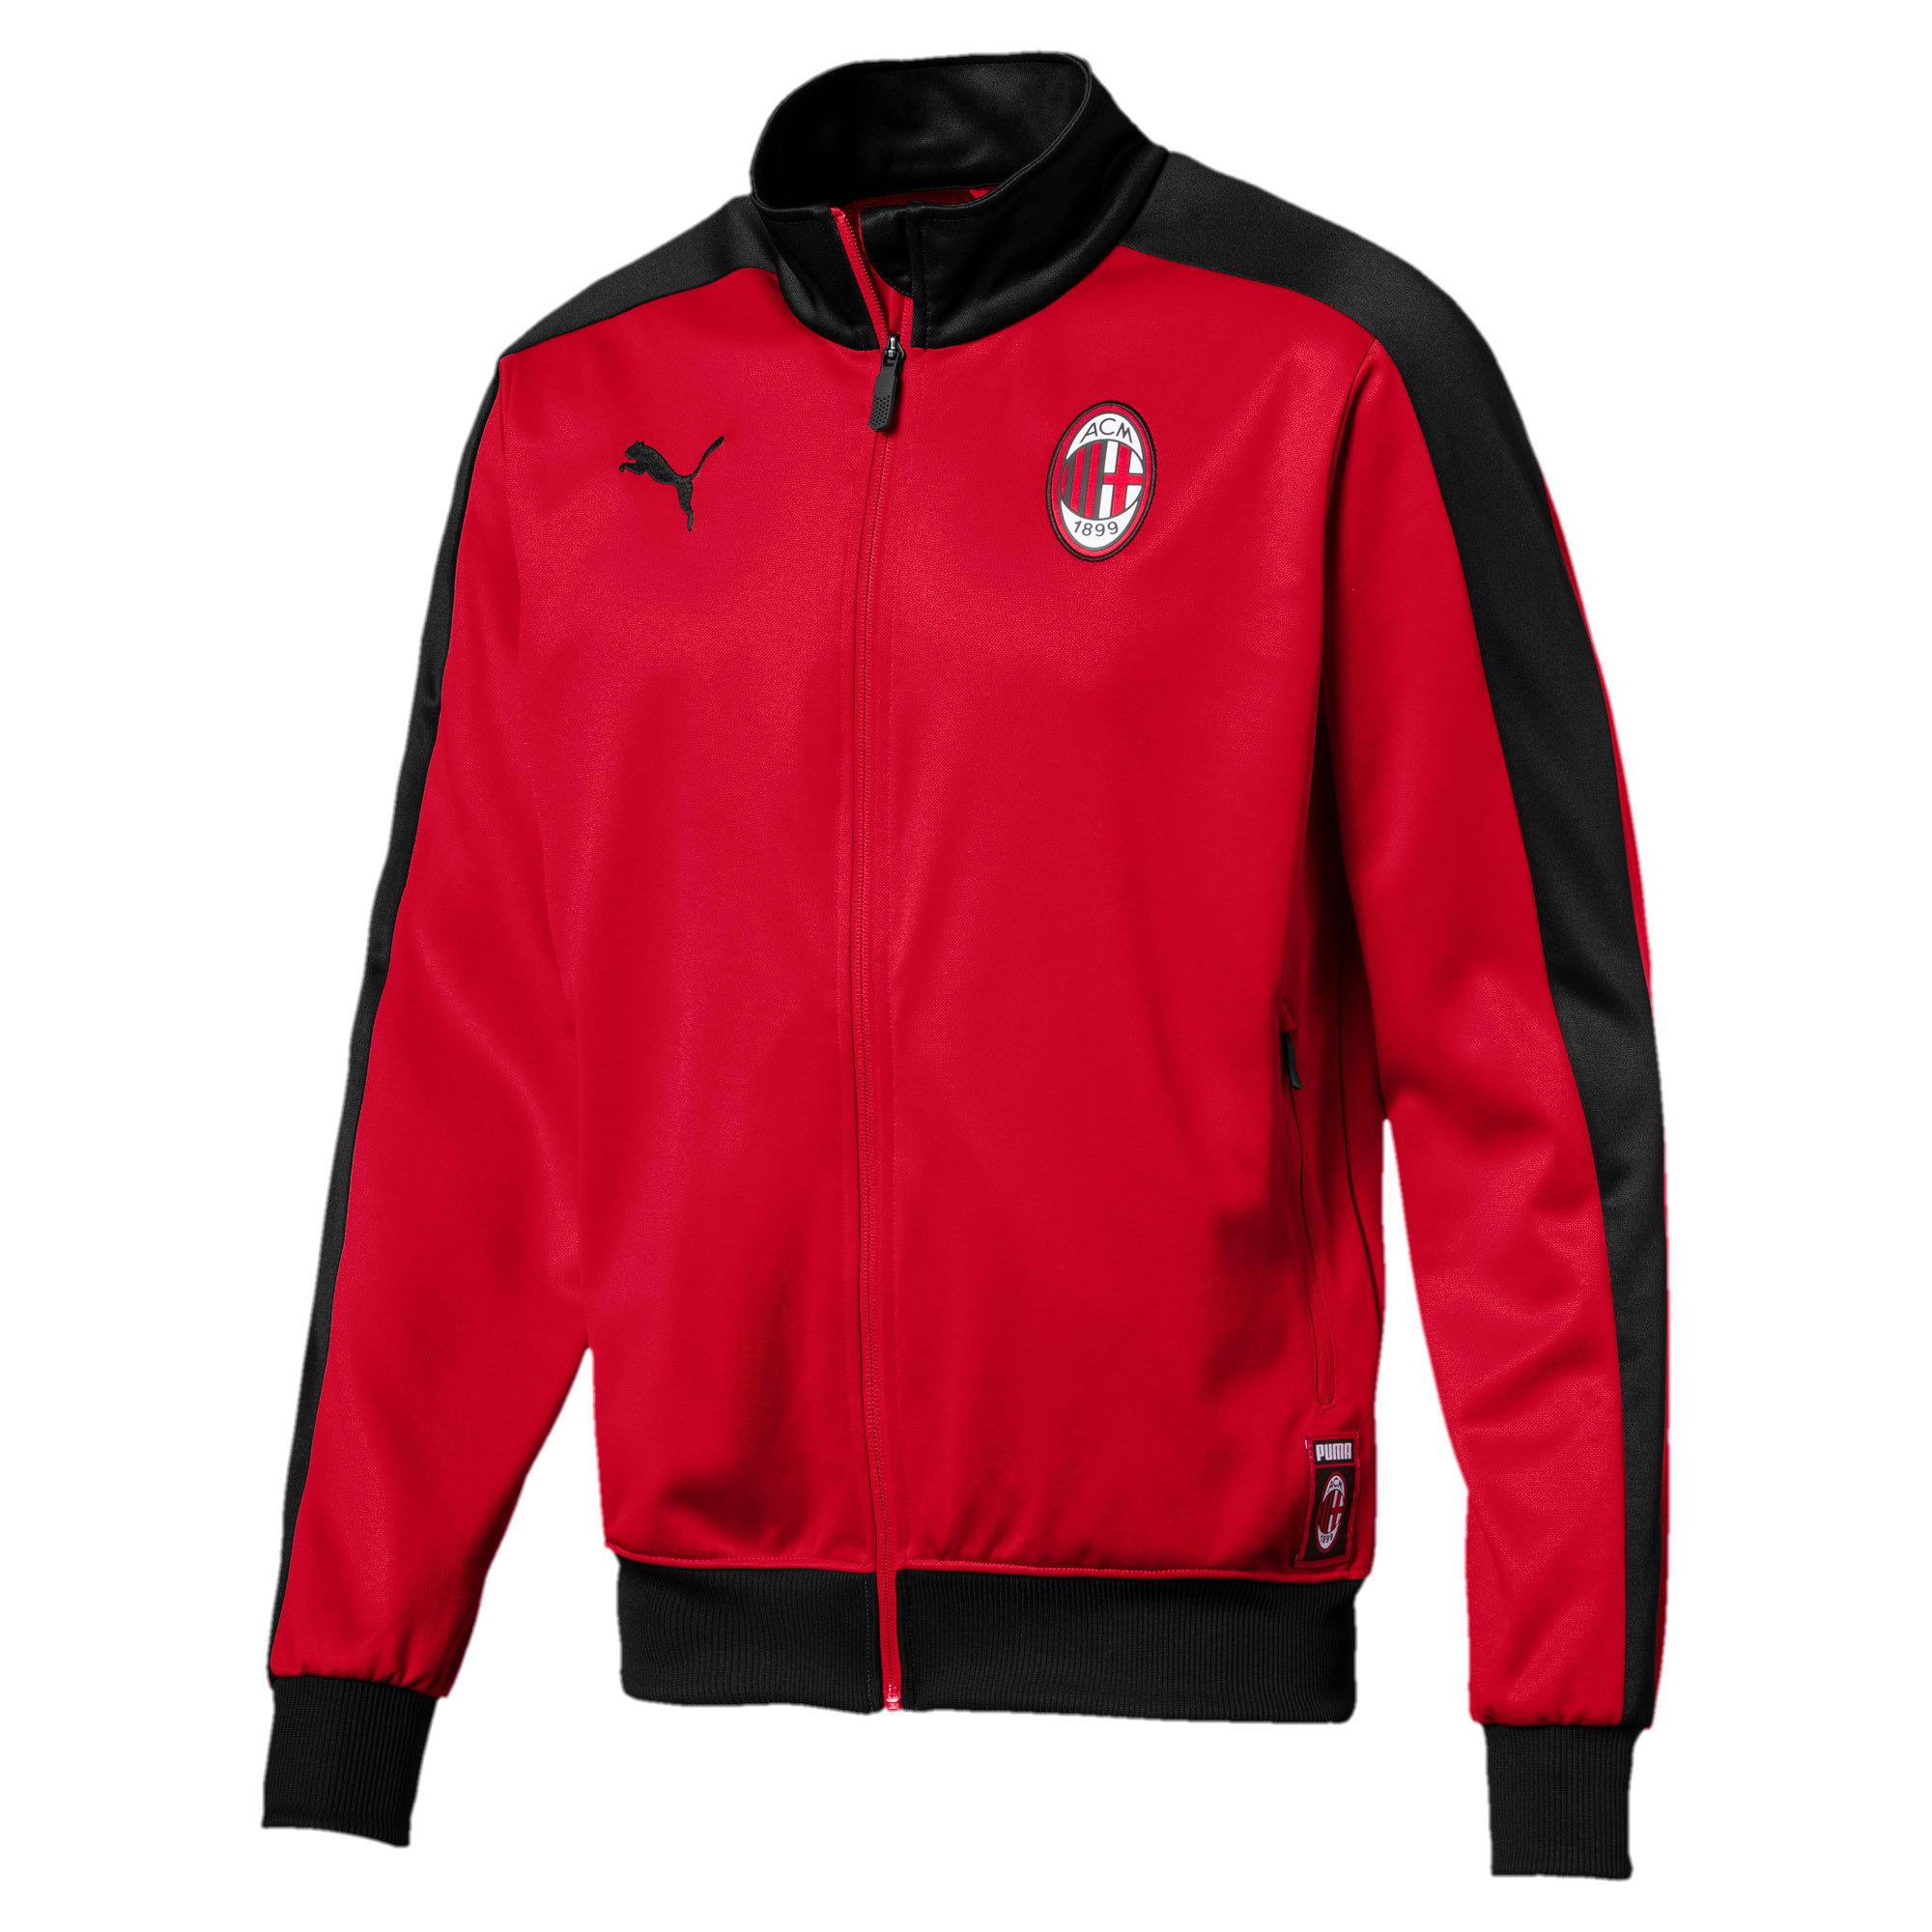 Thumbnail 1 of AC Milan Men's T7 Track Jacket, Tango Red-Puma Black, medium